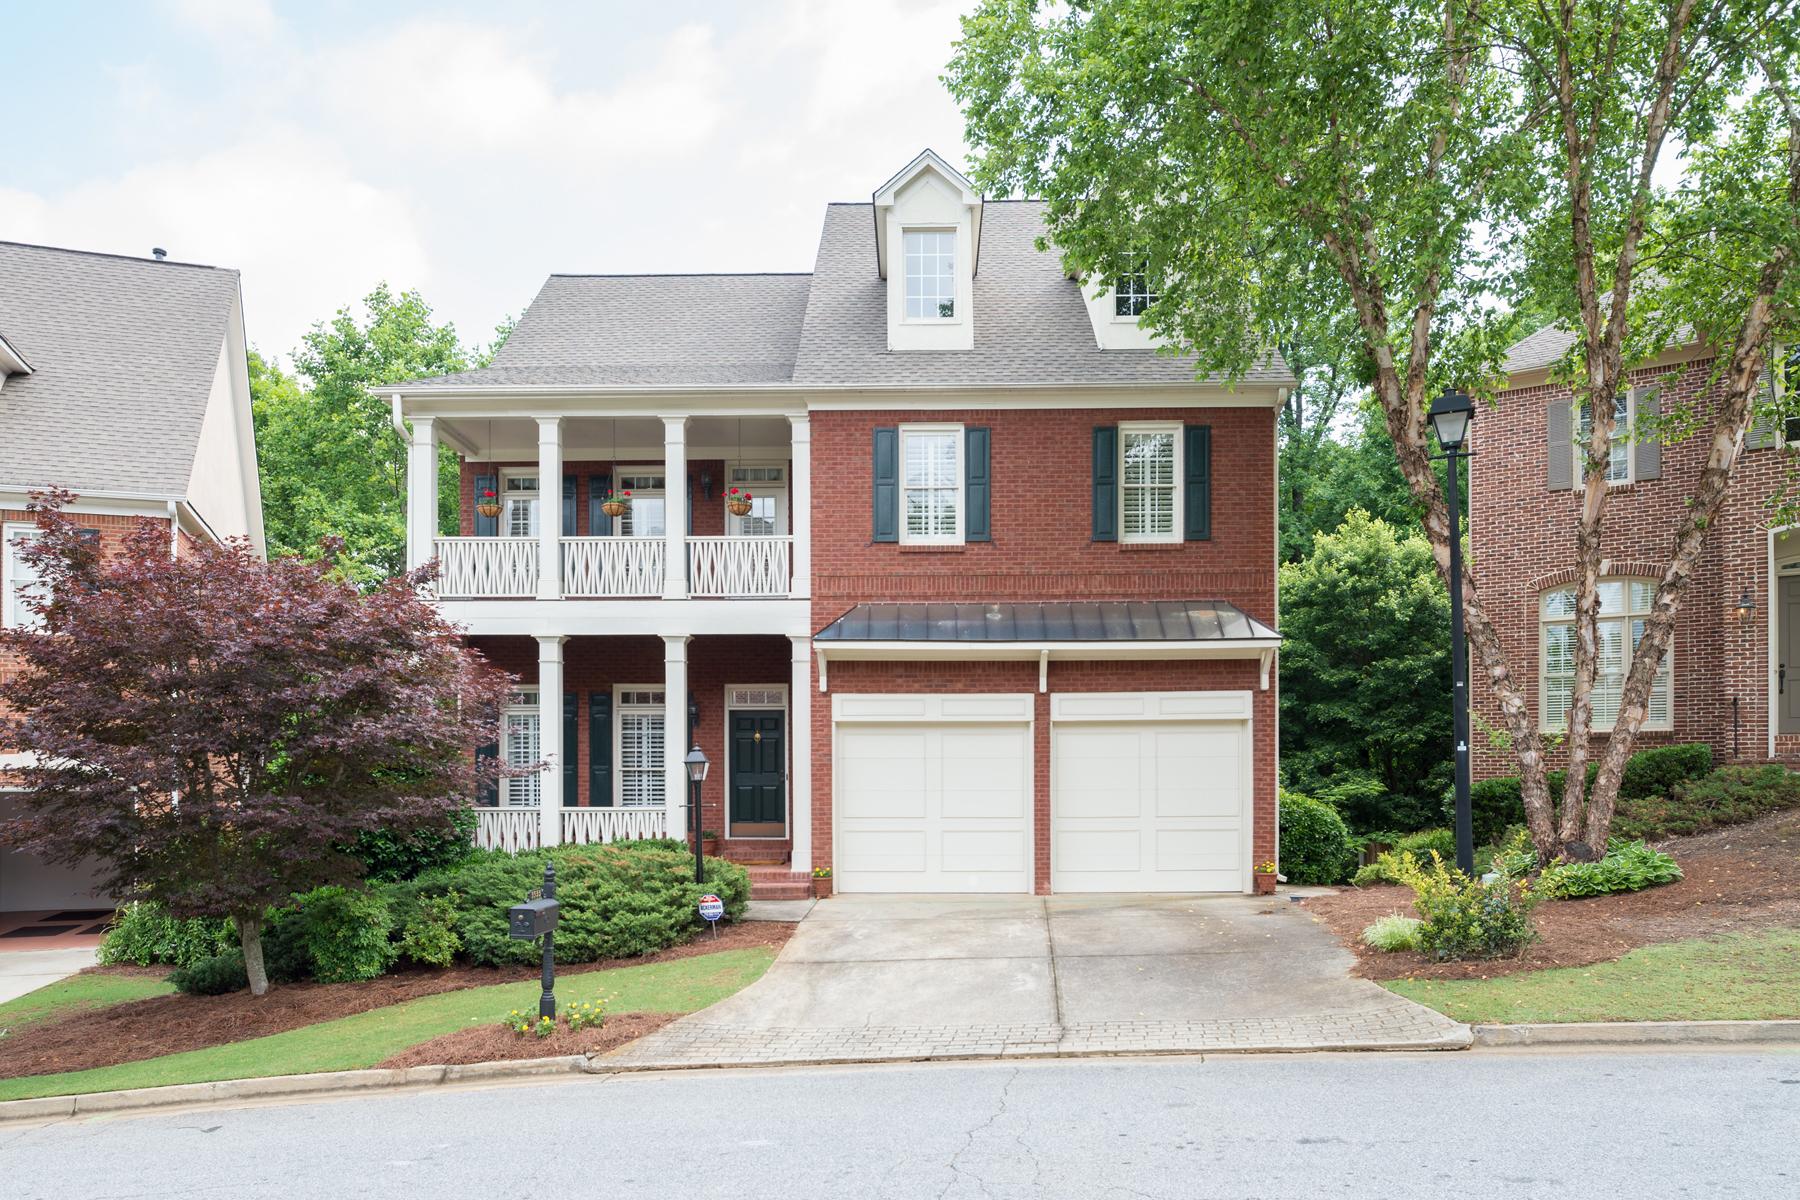 Single Family Home for Sale at Handsome Brick Traditional 3533 Highgrove Way Atlanta, Georgia 30319 United States